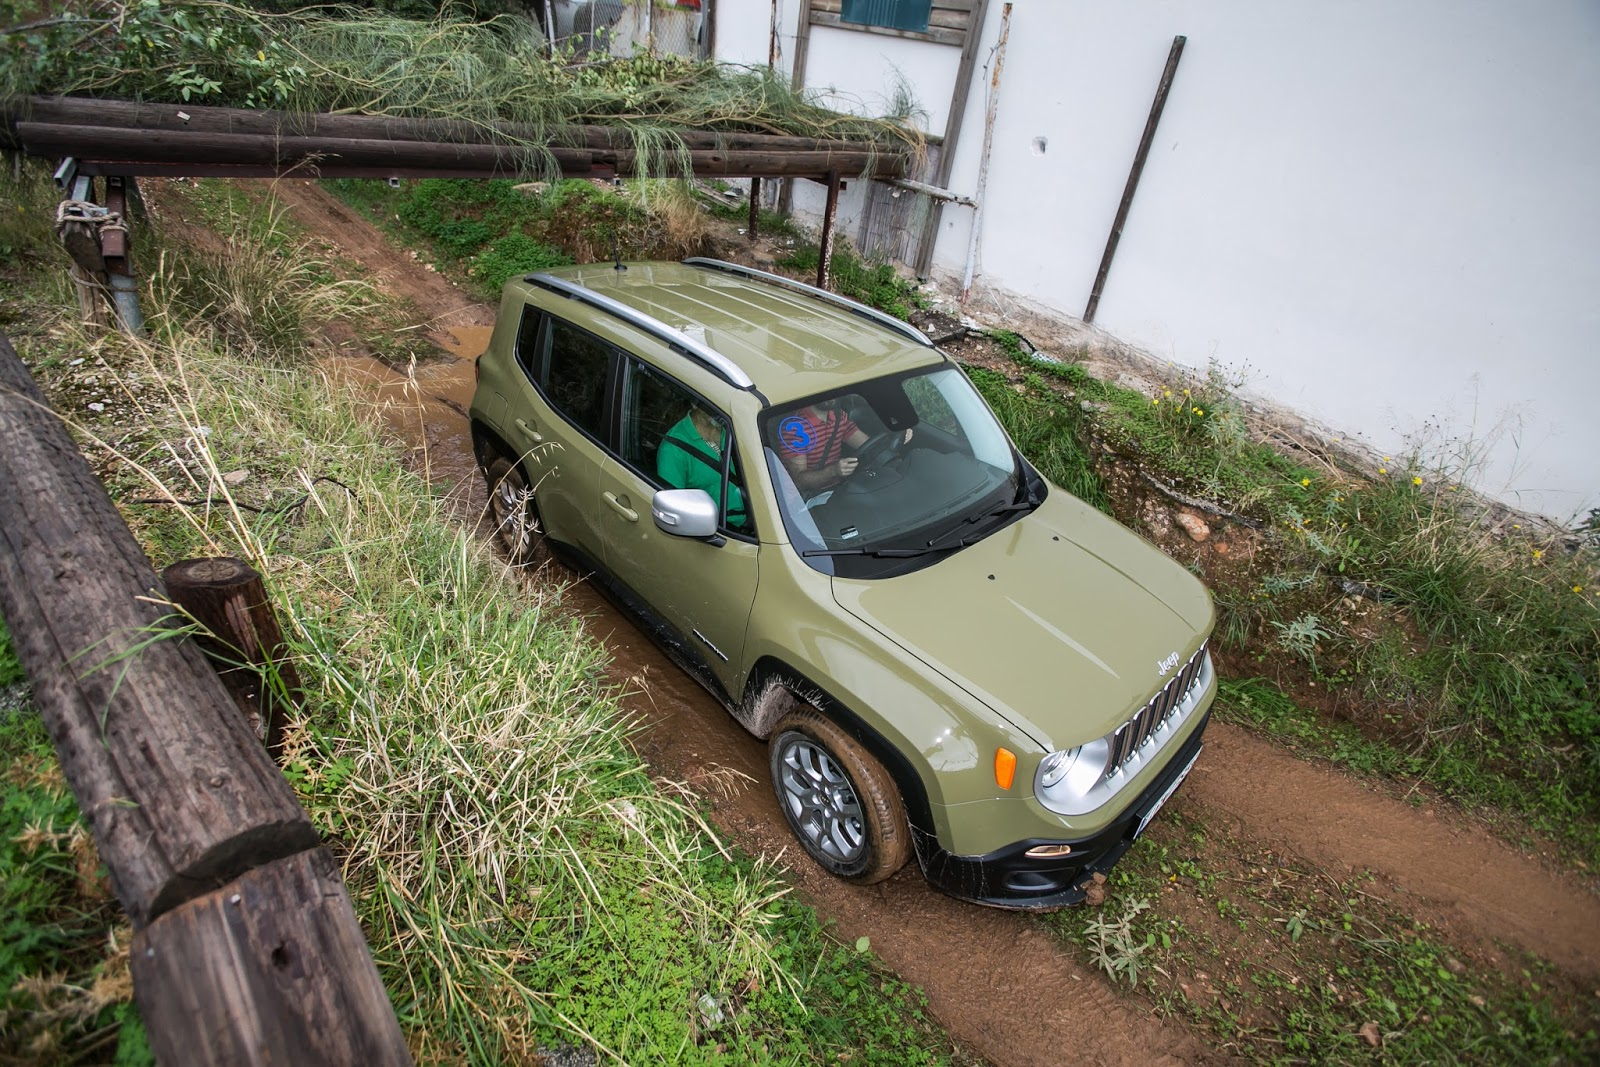 GK 0402 Πετάμε ένα Jeep Renegade σε λάσπες, πέτρες, άμμο, λίμνες. Θα τα καταφέρει; Jeep, Jeep Renegade, Renegade, SUV, TEST, zblog, ΔΟΚΙΜΕΣ